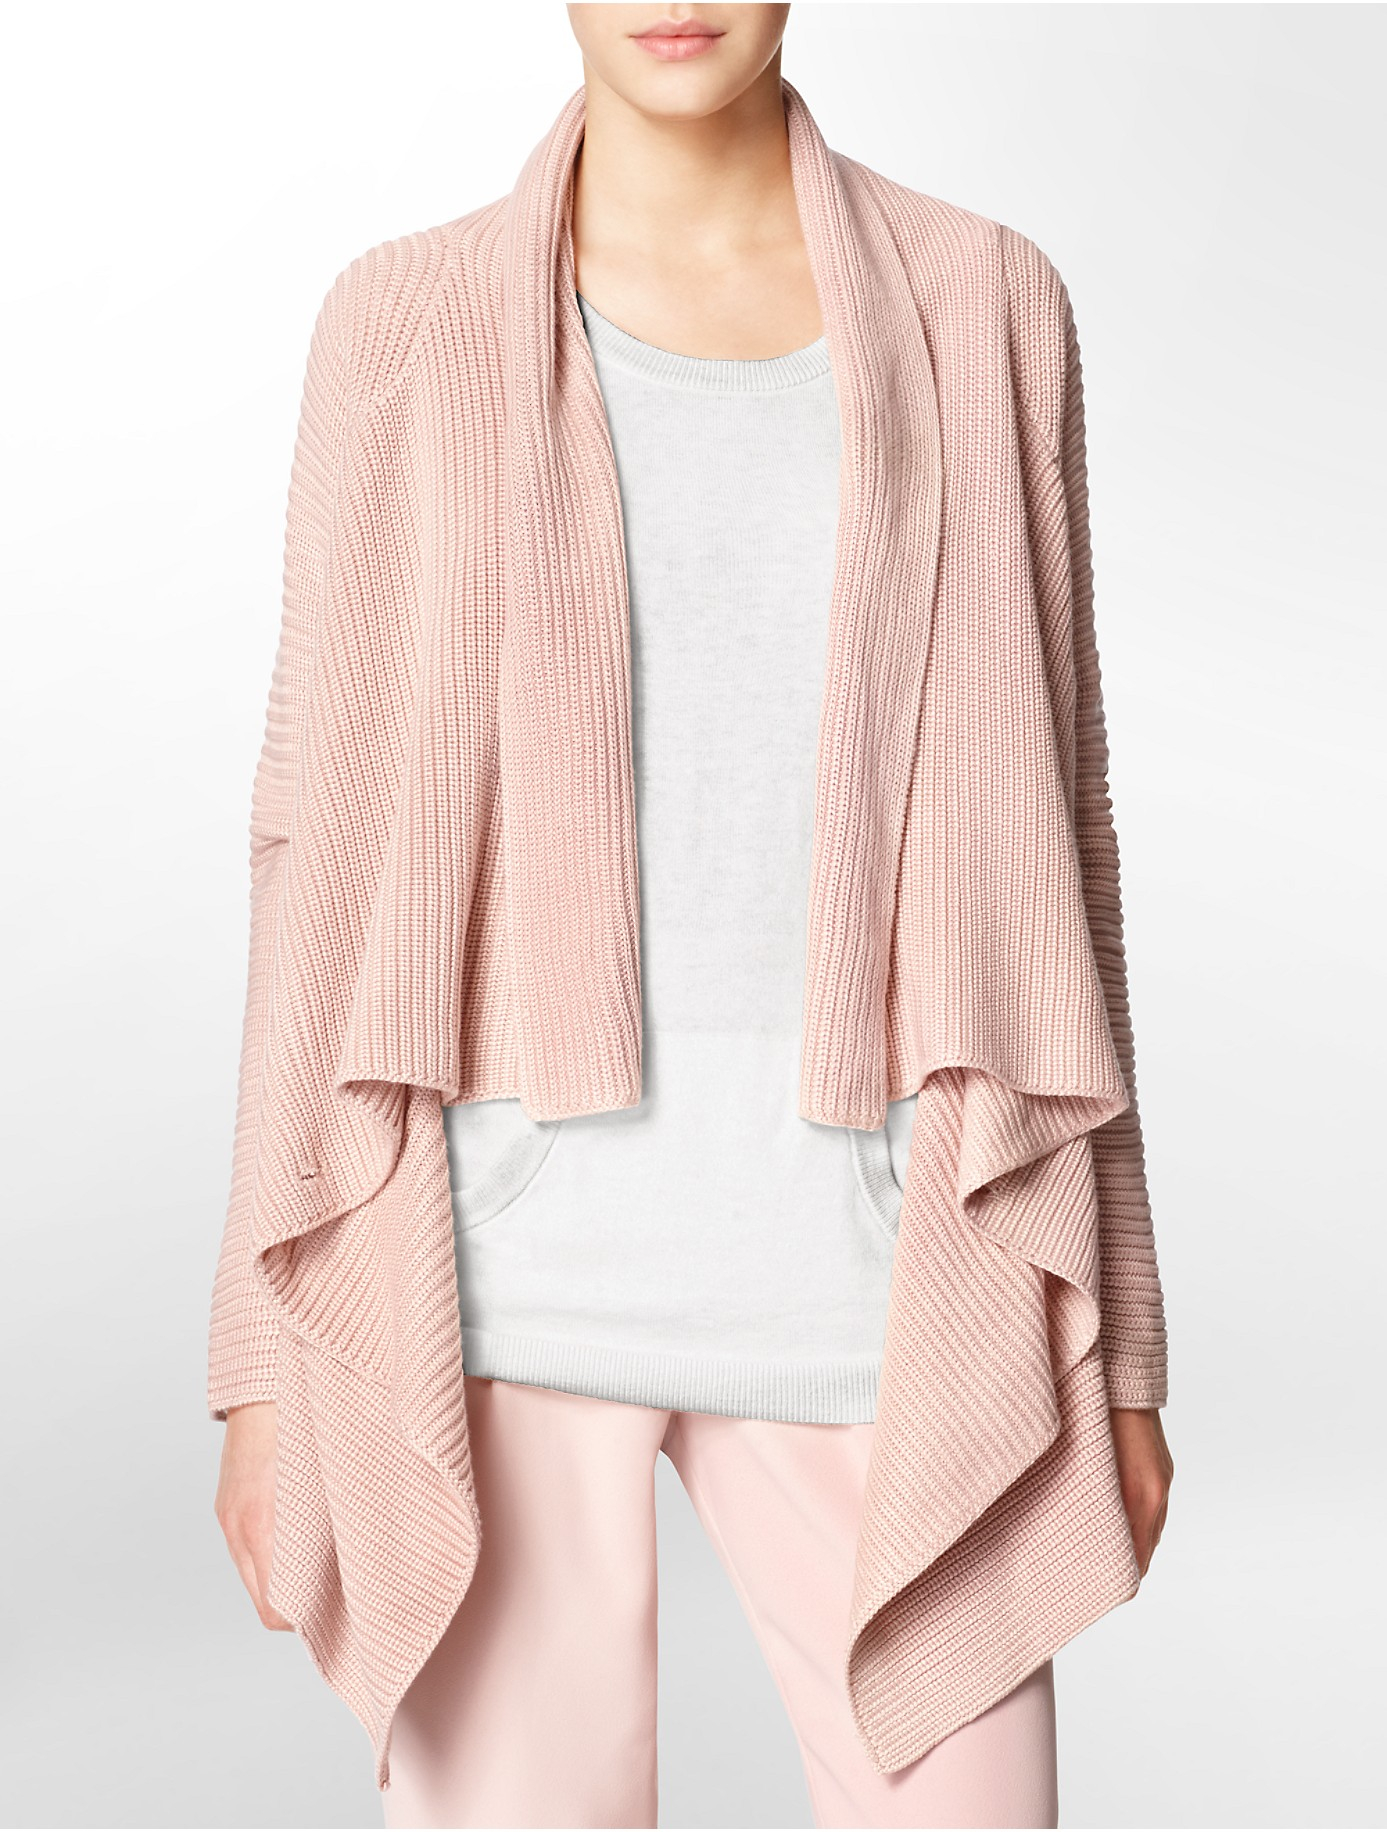 calvin klein white label rib knit sweater jacket in pink. Black Bedroom Furniture Sets. Home Design Ideas